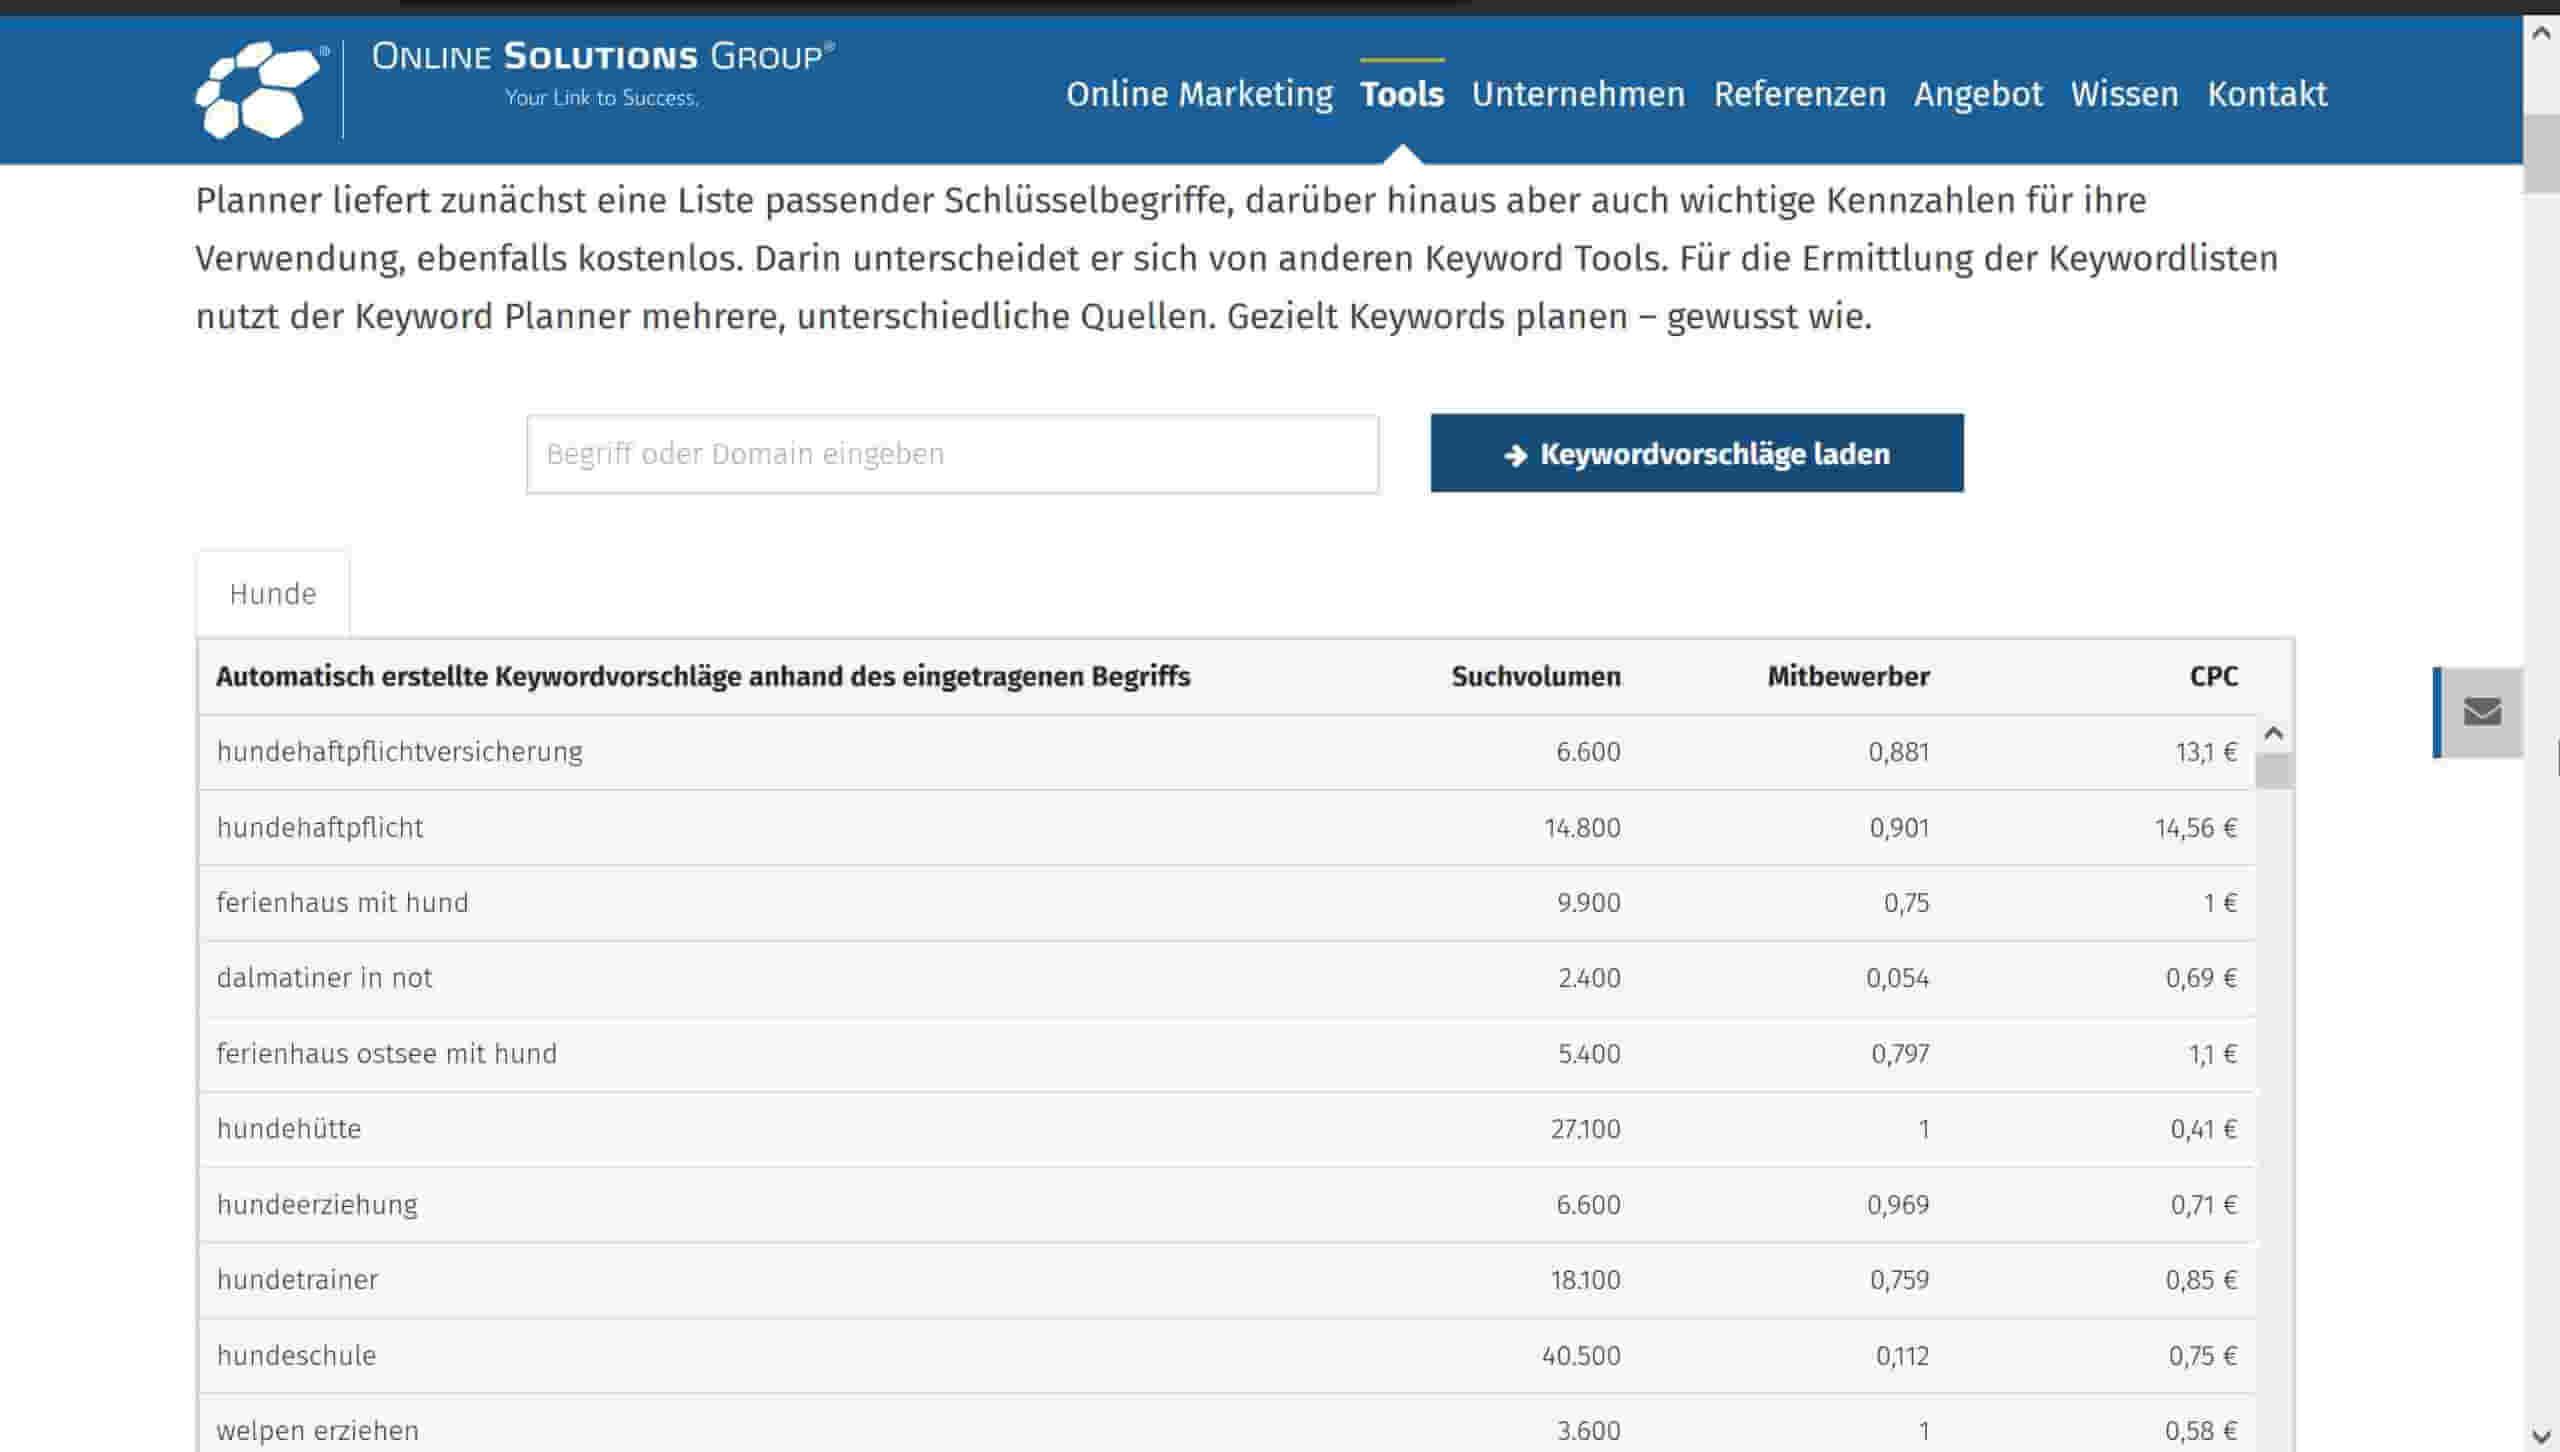 Online Solutions Group Keyword Planner